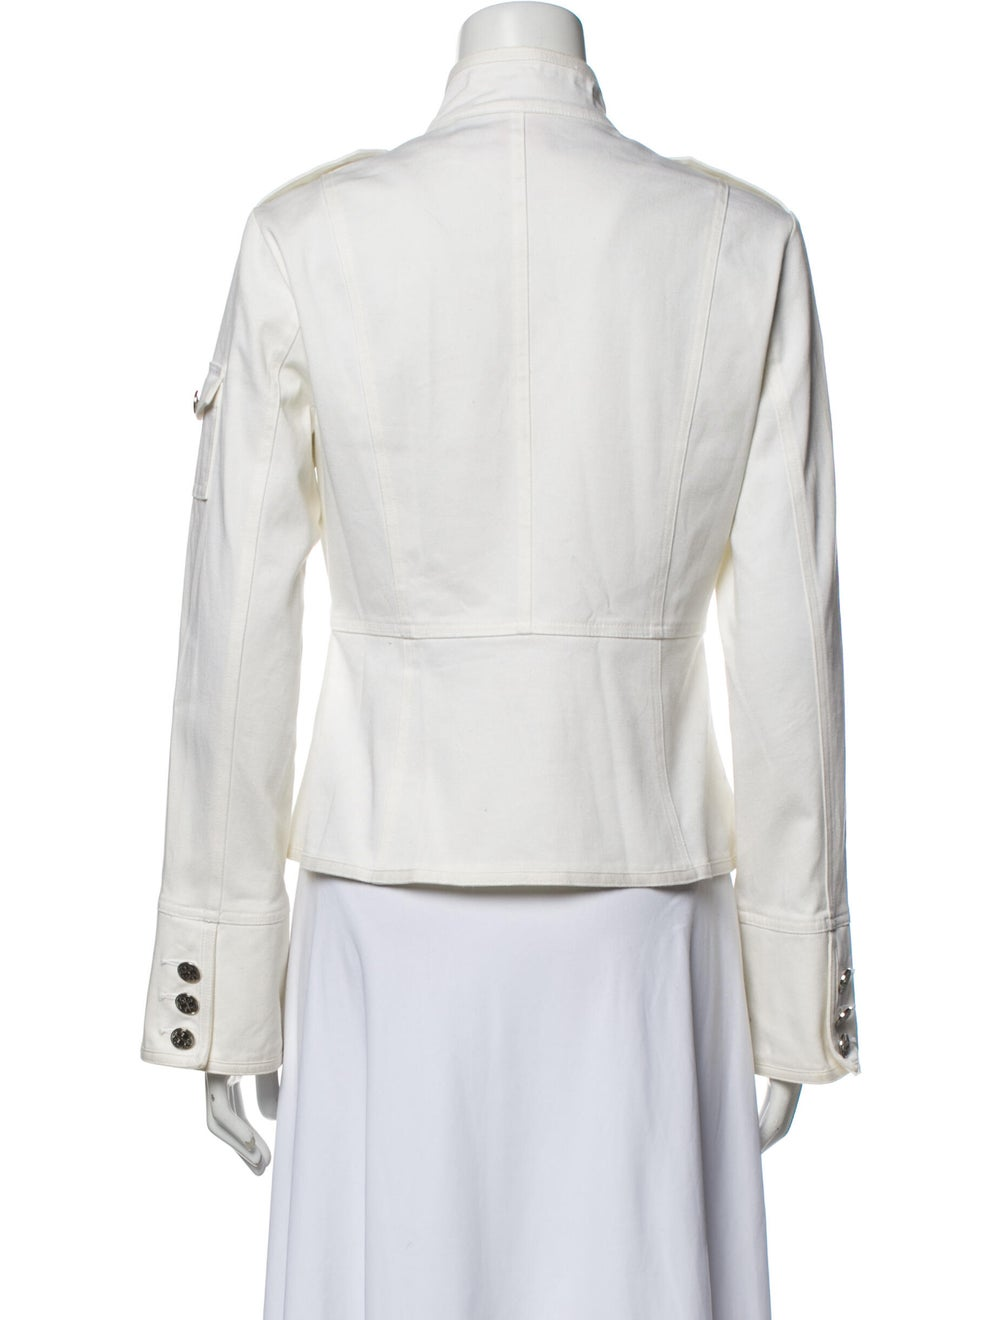 Tory Burch Denim Jacket Denim - image 3